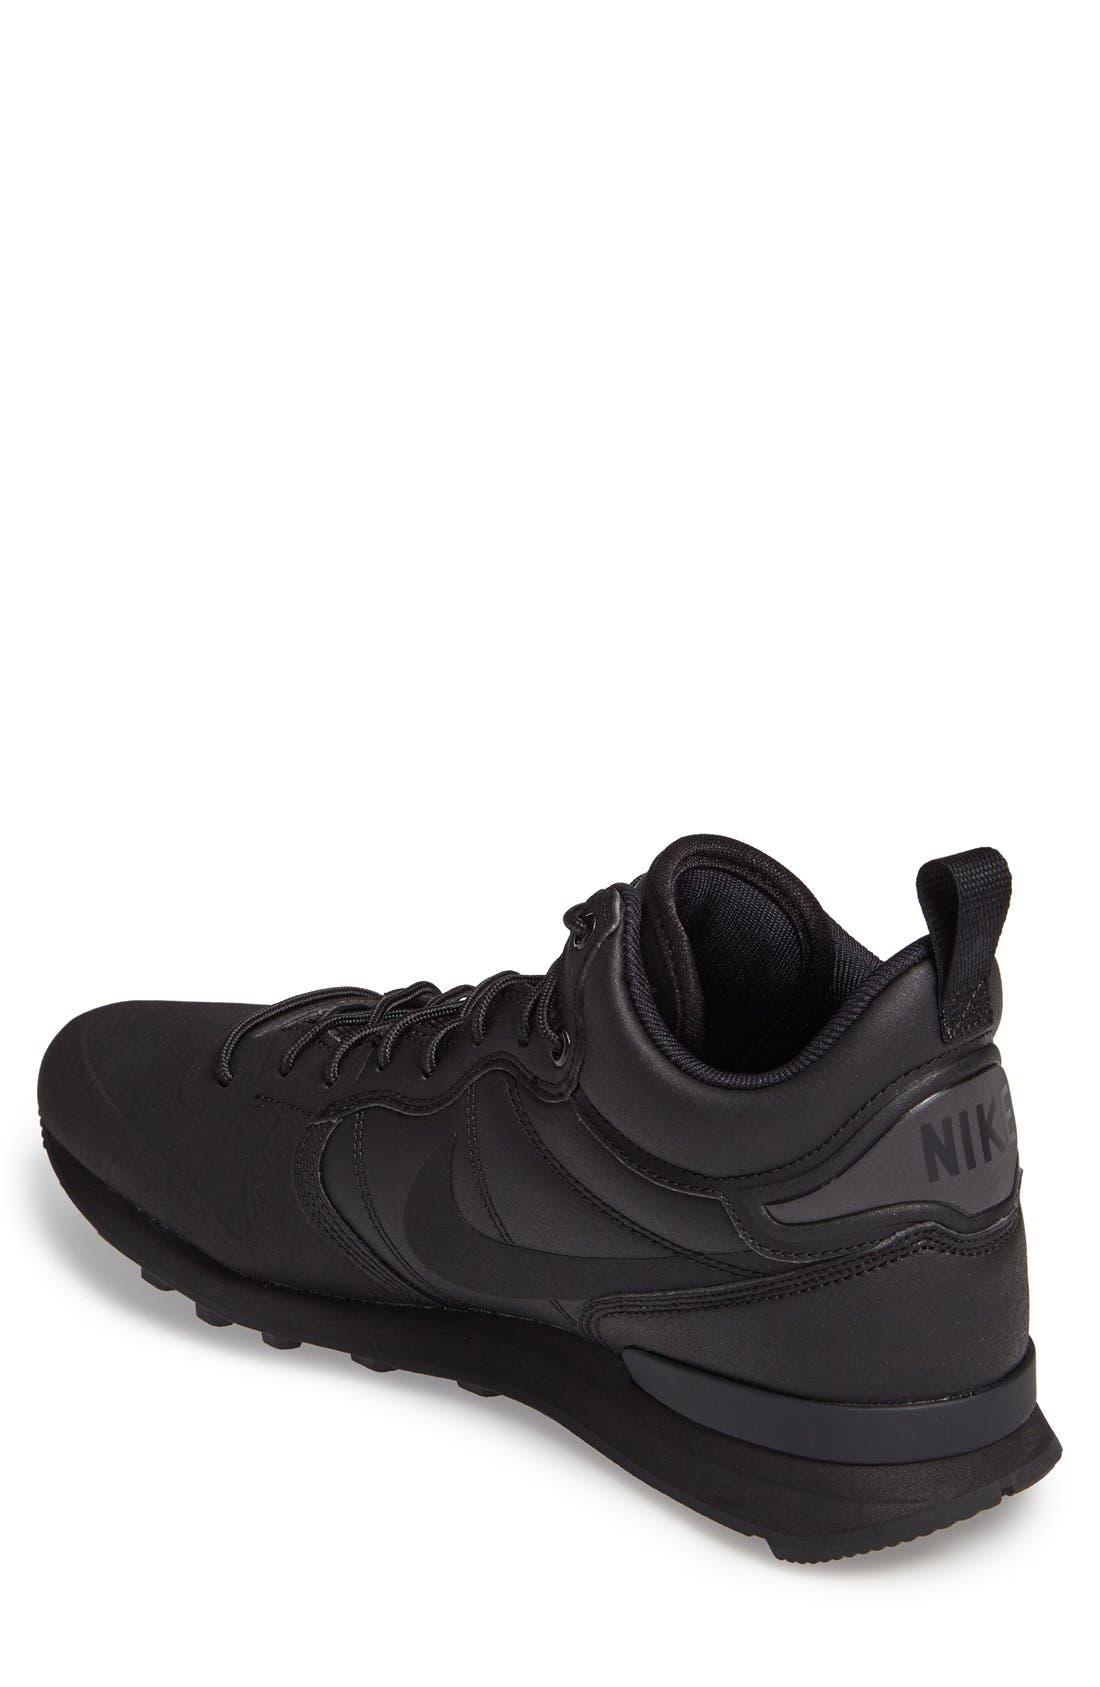 Internationalist Utility Sneaker,                             Alternate thumbnail 5, color,                             001